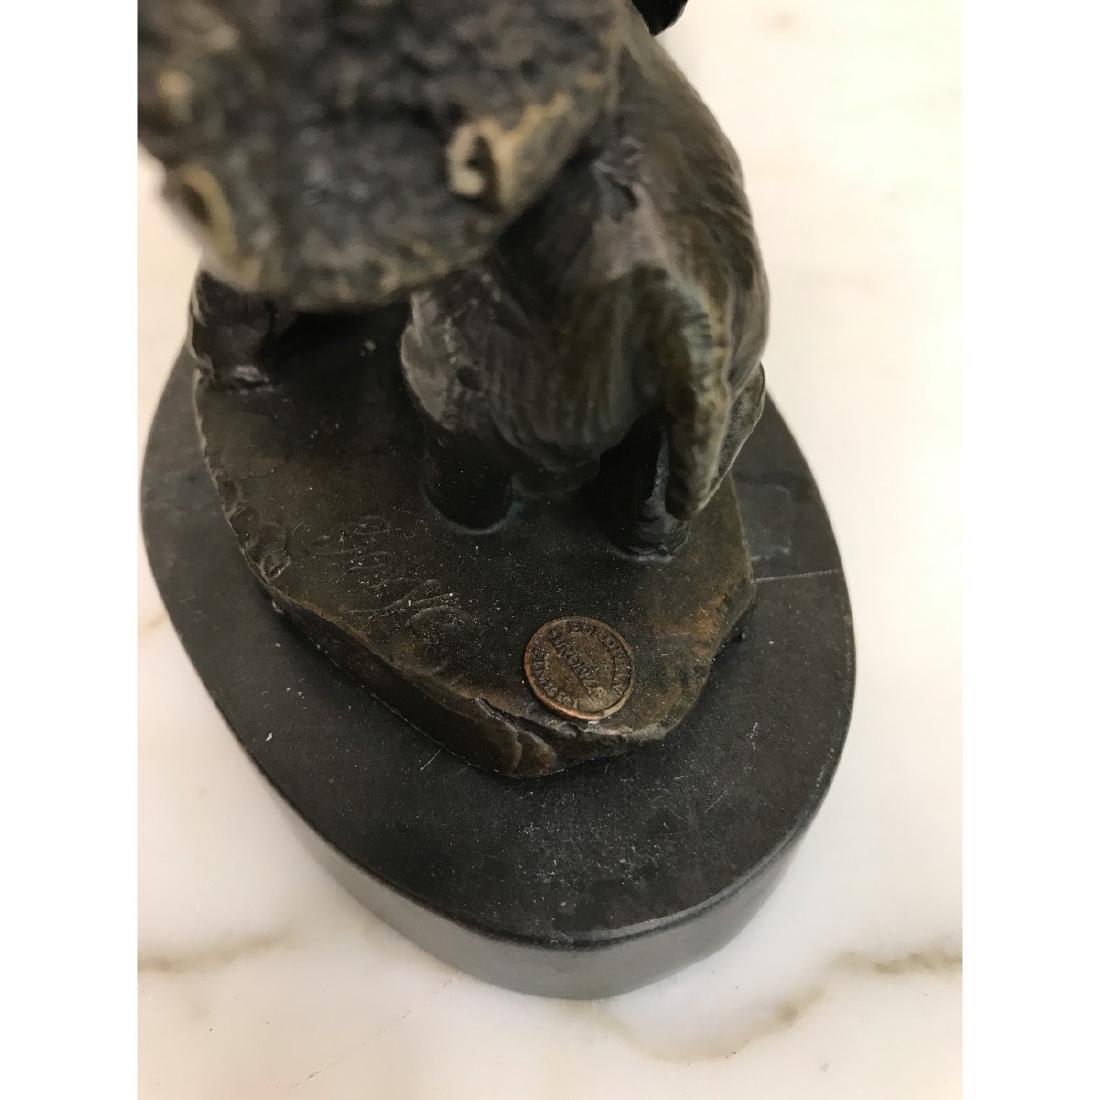 Miniature Bronze Statue of Group of Elephants - 8